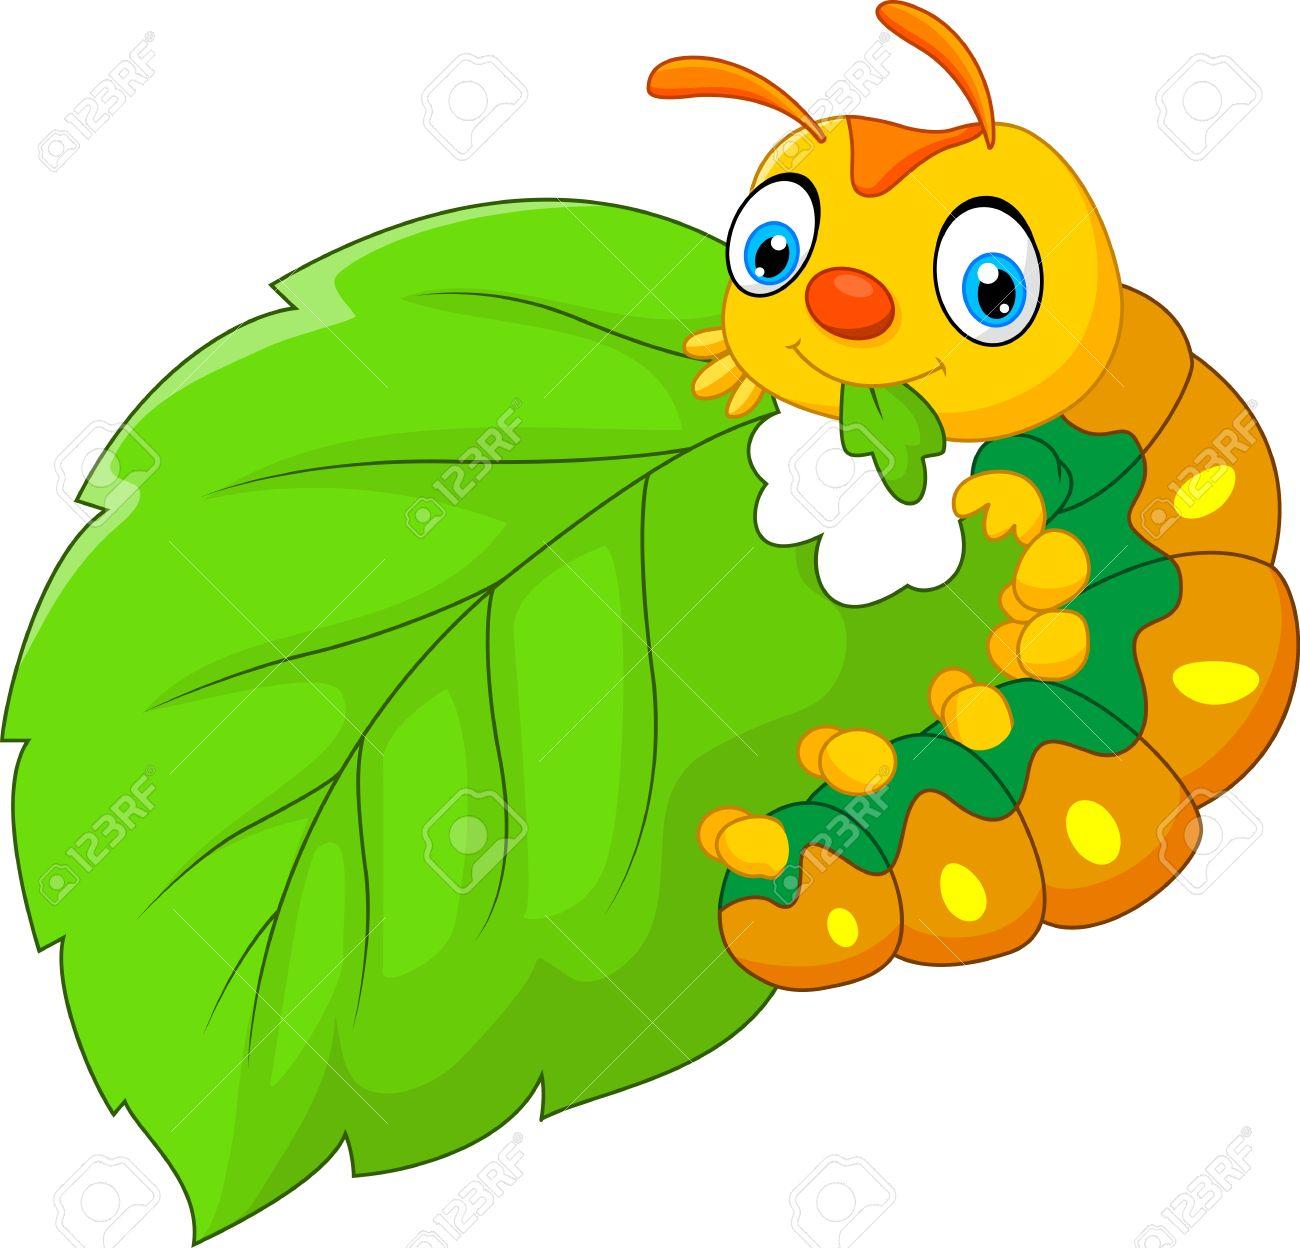 Caterpillar Eating Leaf Clipart.